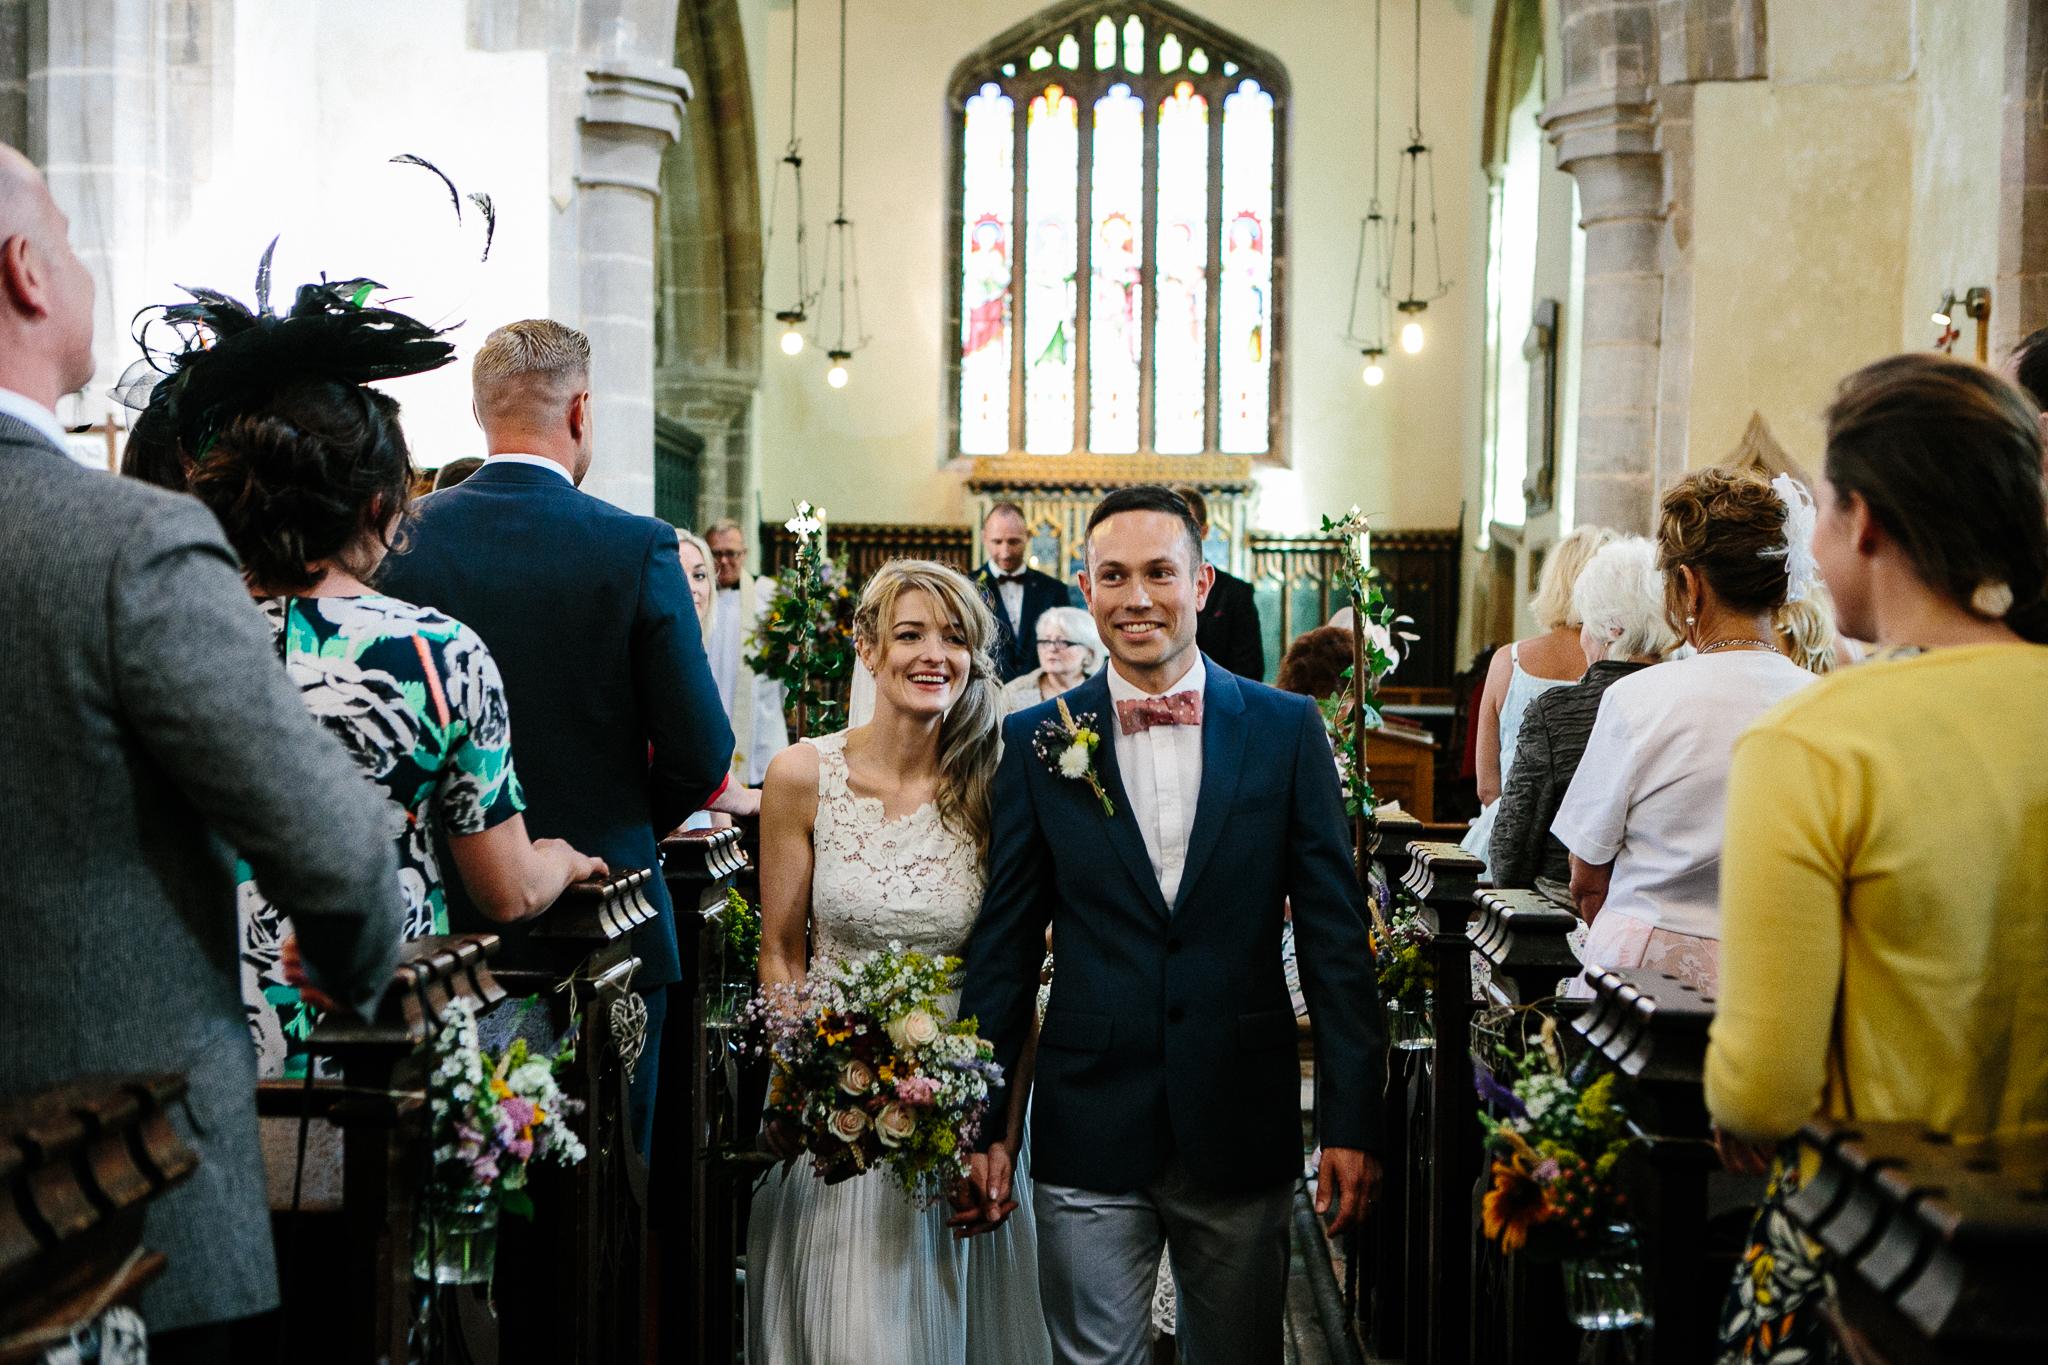 grantham_wedding_photographer-59.jpg